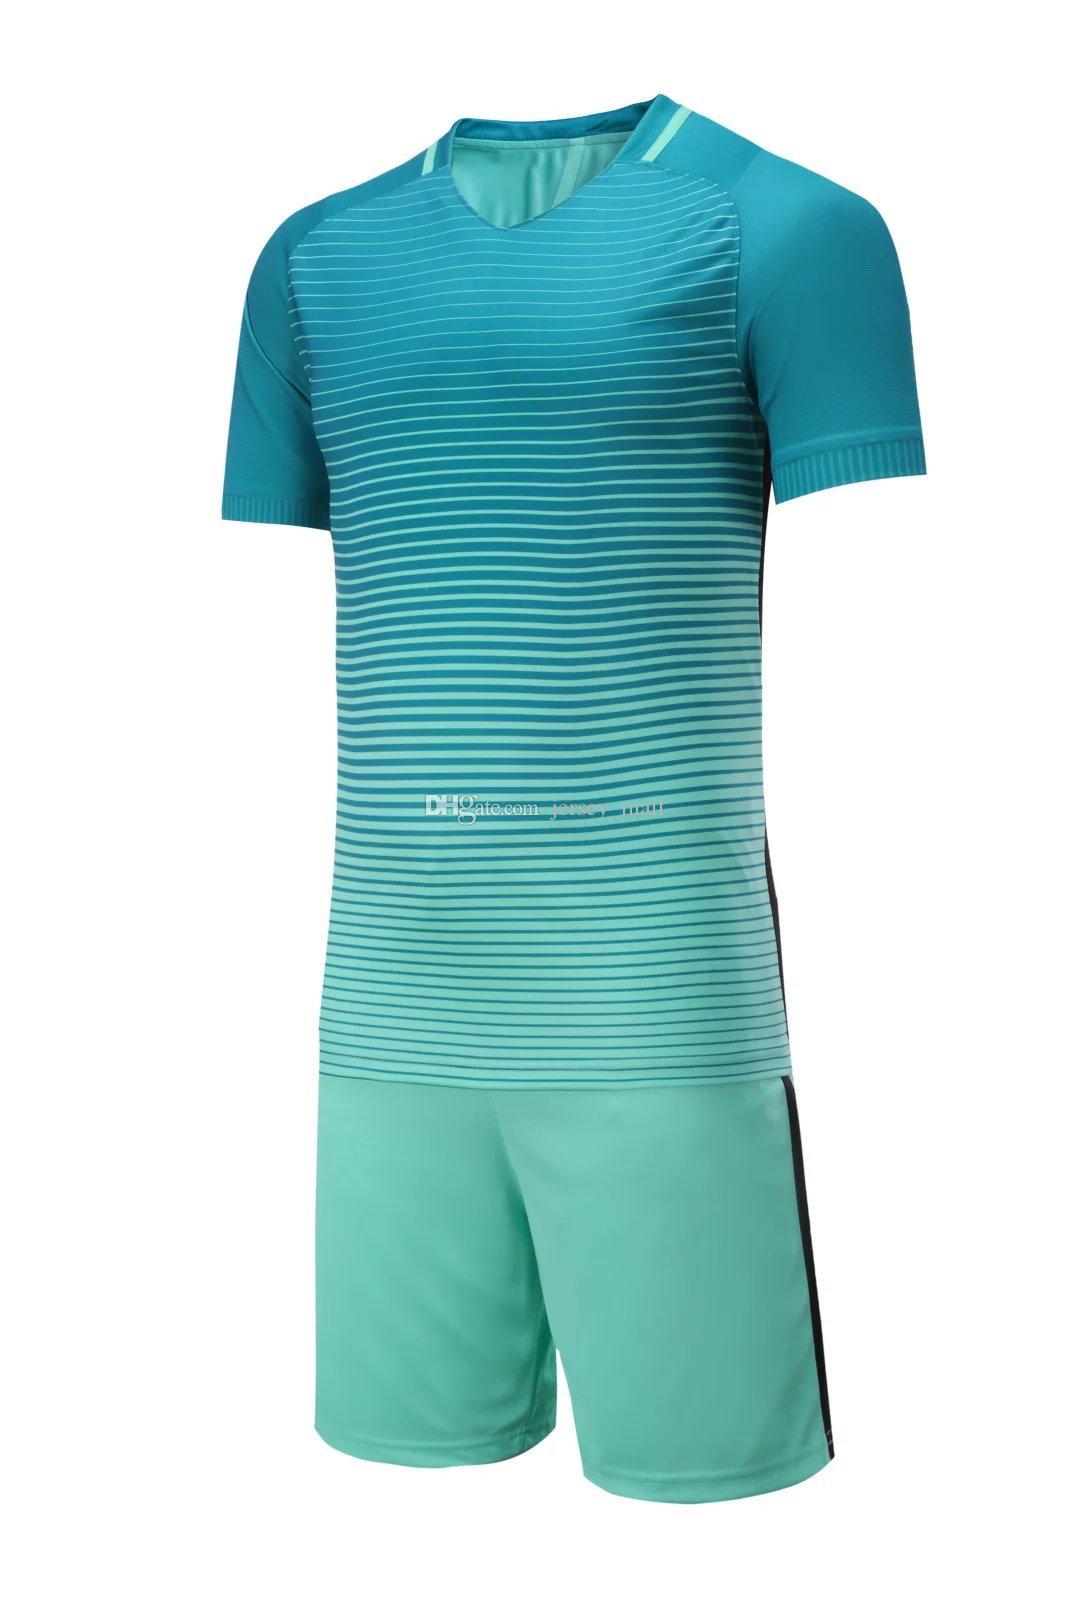 wholesale soccer jersey kit football tshirt shorts pants uniform set / men  s sport articles Blank jersey -- support customize name num